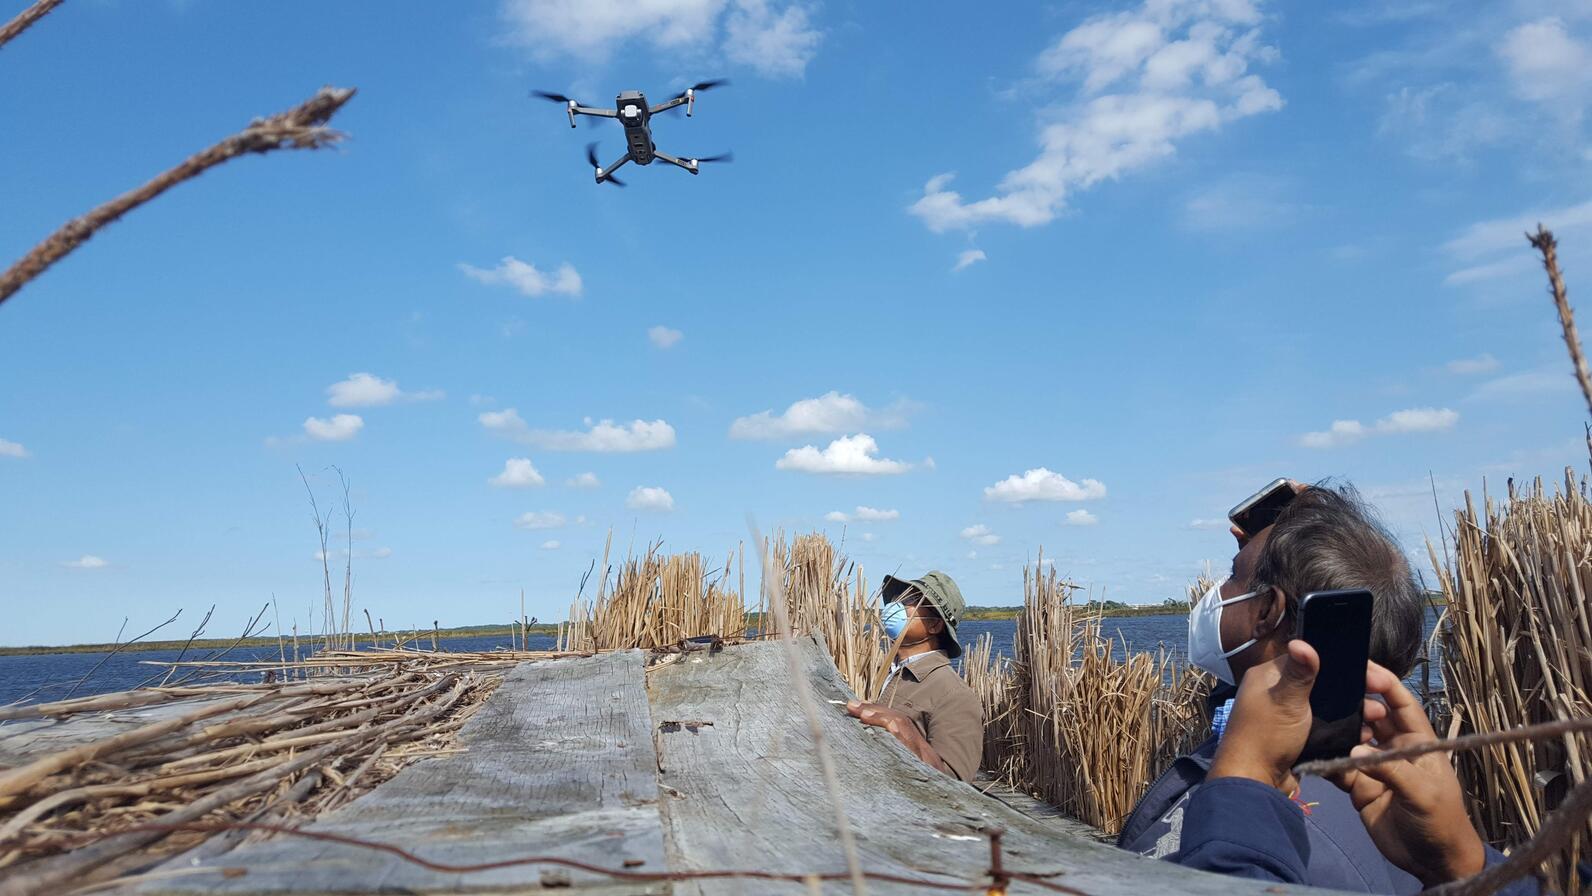 The ECSU drone team at Pine Island.